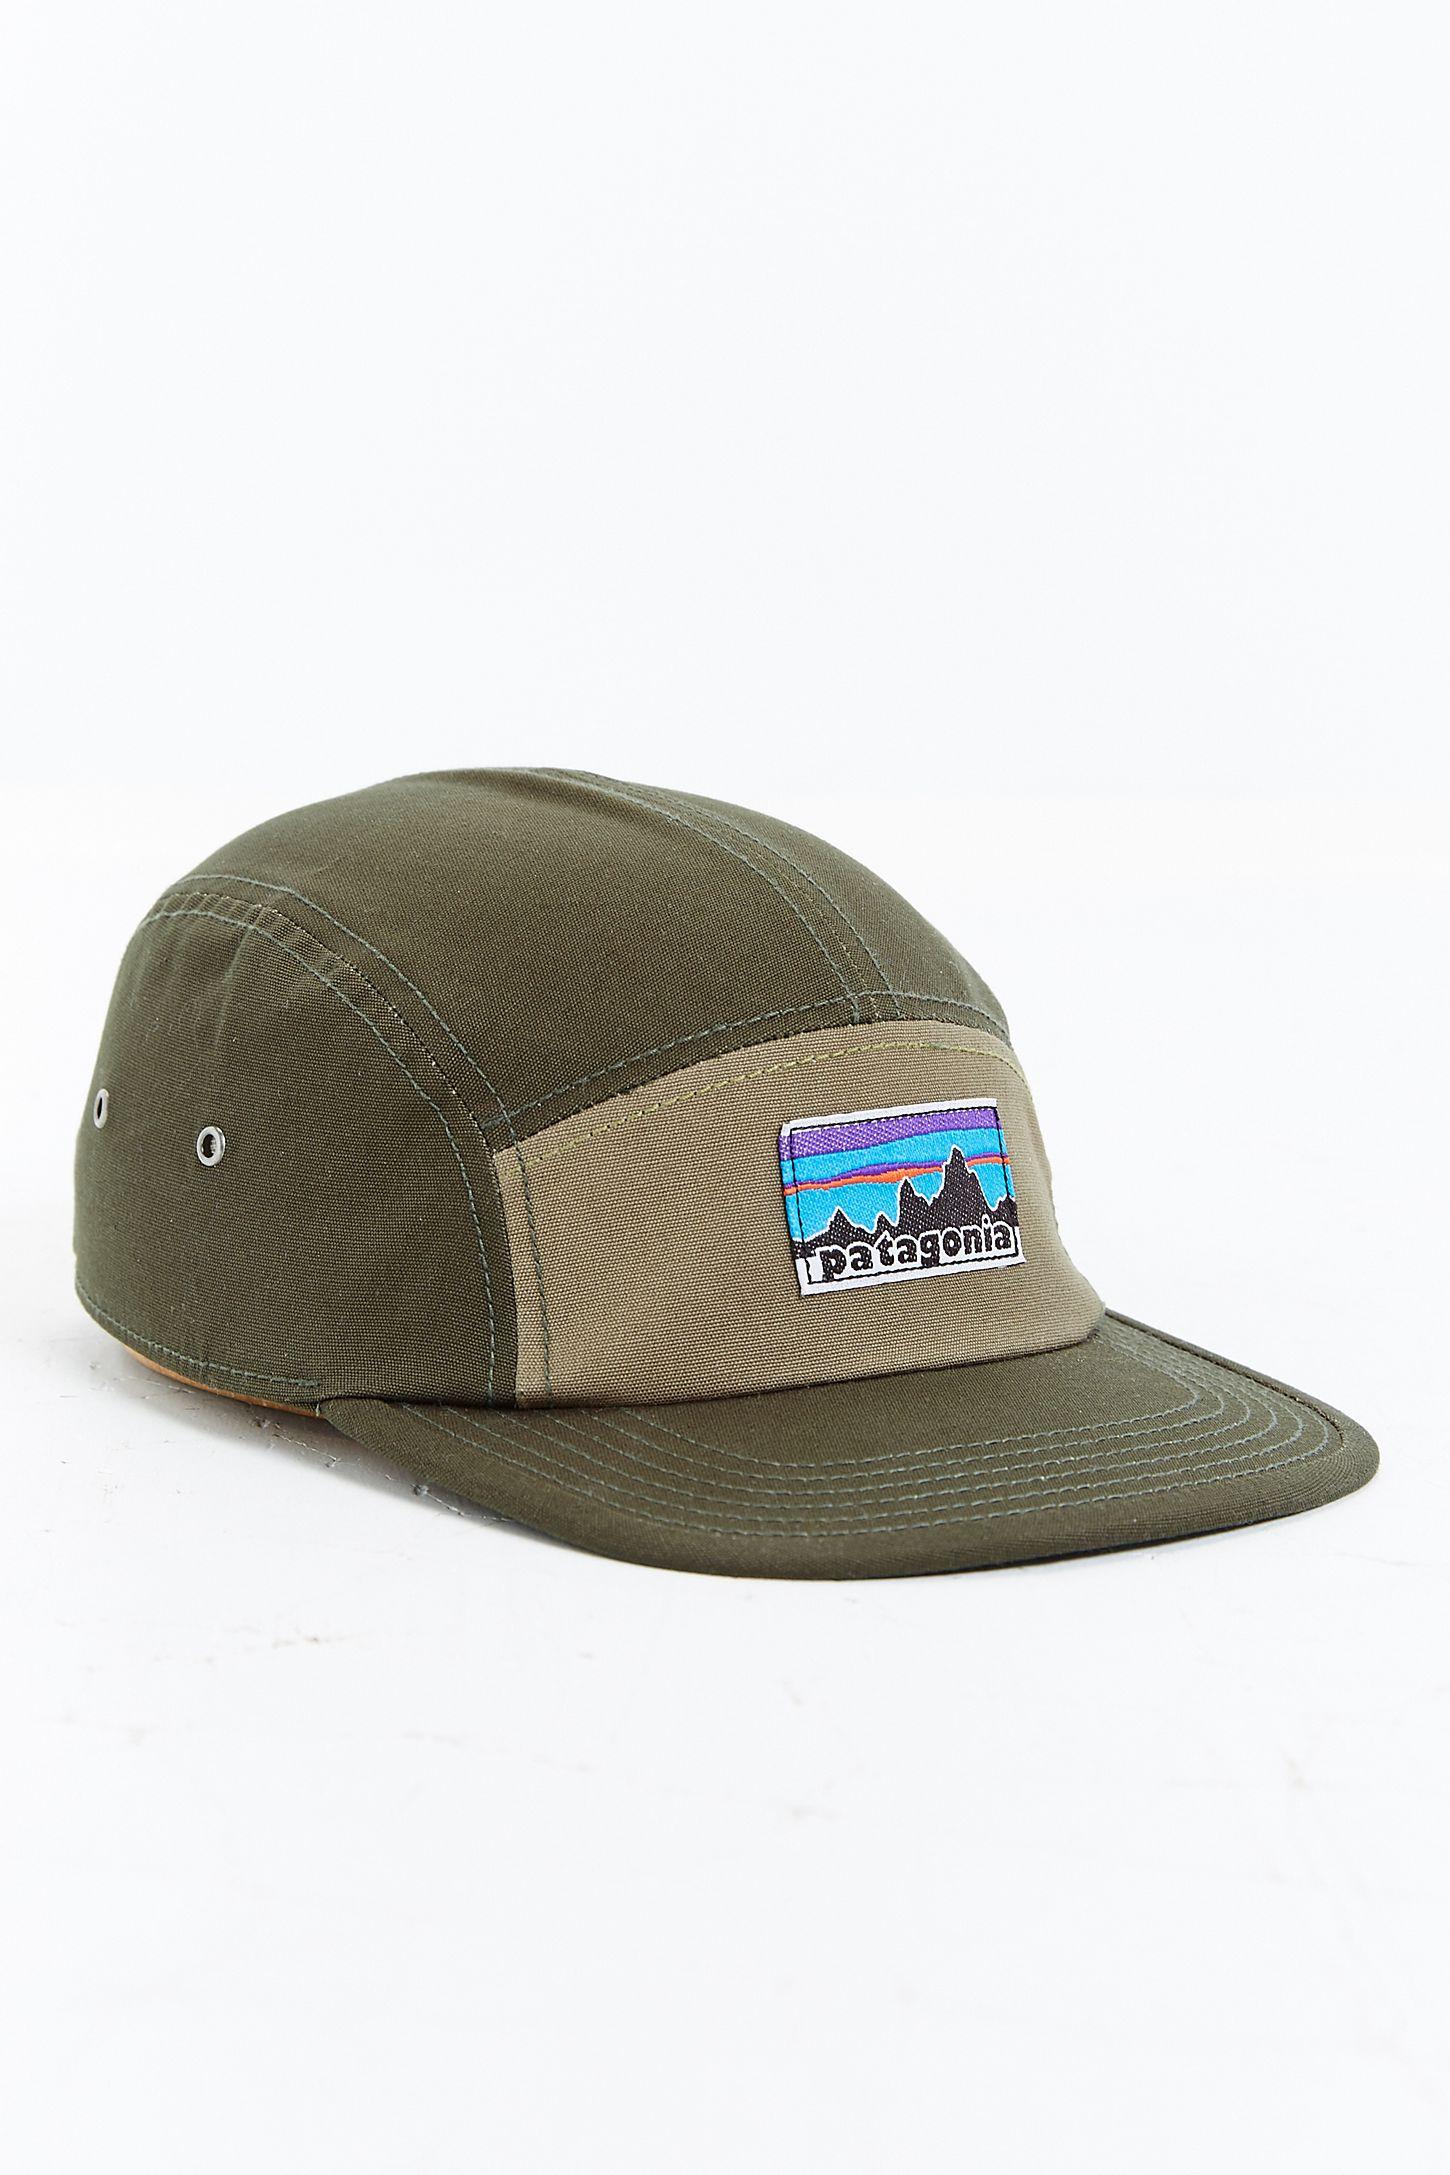 27cbb6647cf87 Patagonia Retro Fitz Roy Label 5-Panel Baseball Hat